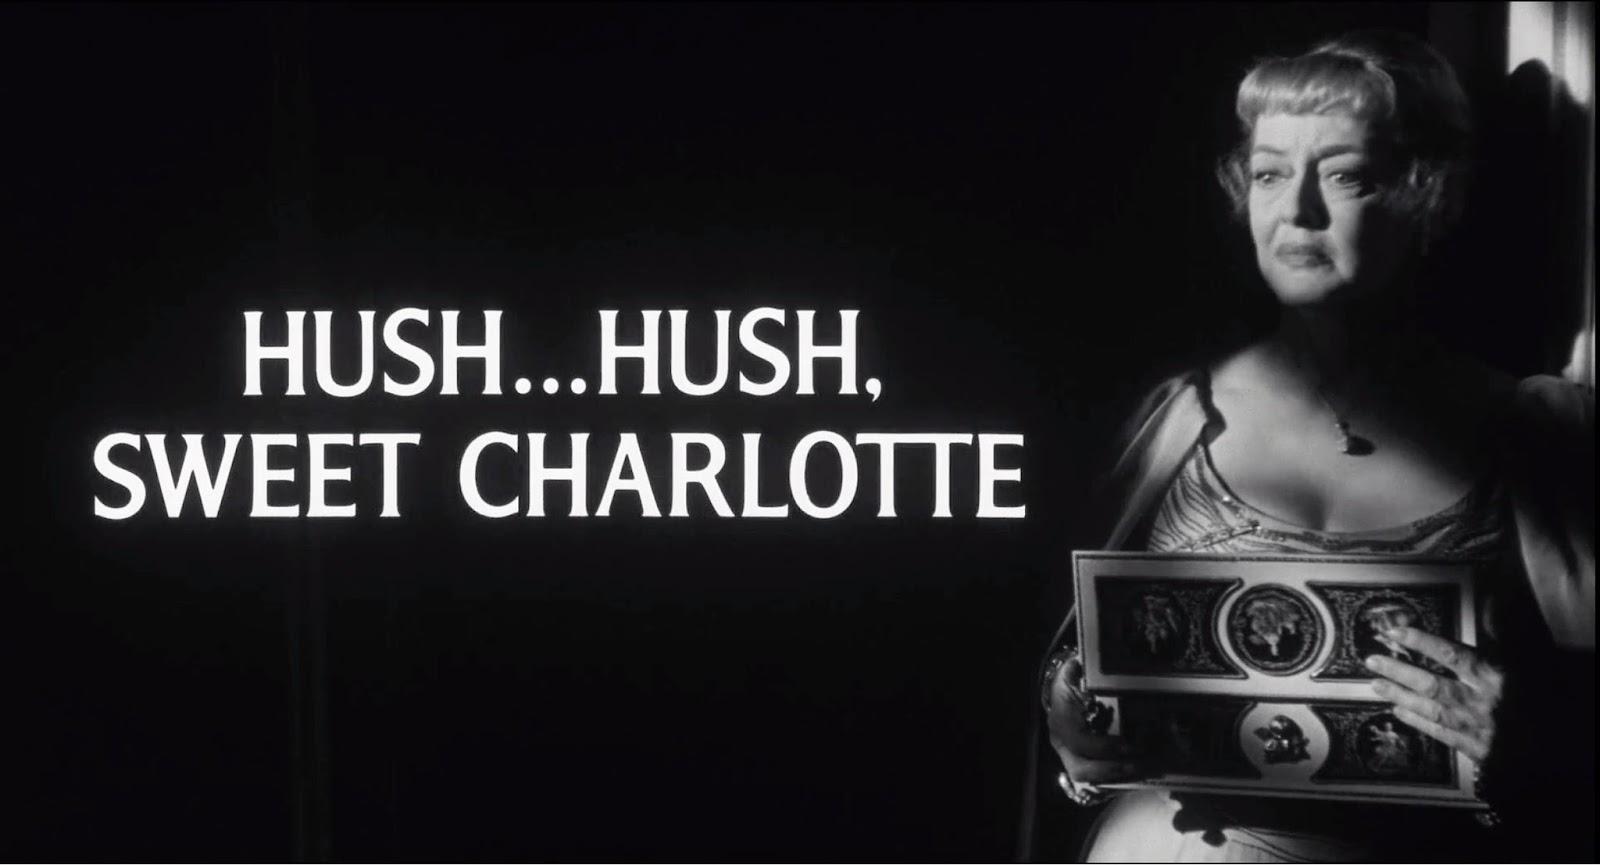 hush hush sweet charlotte